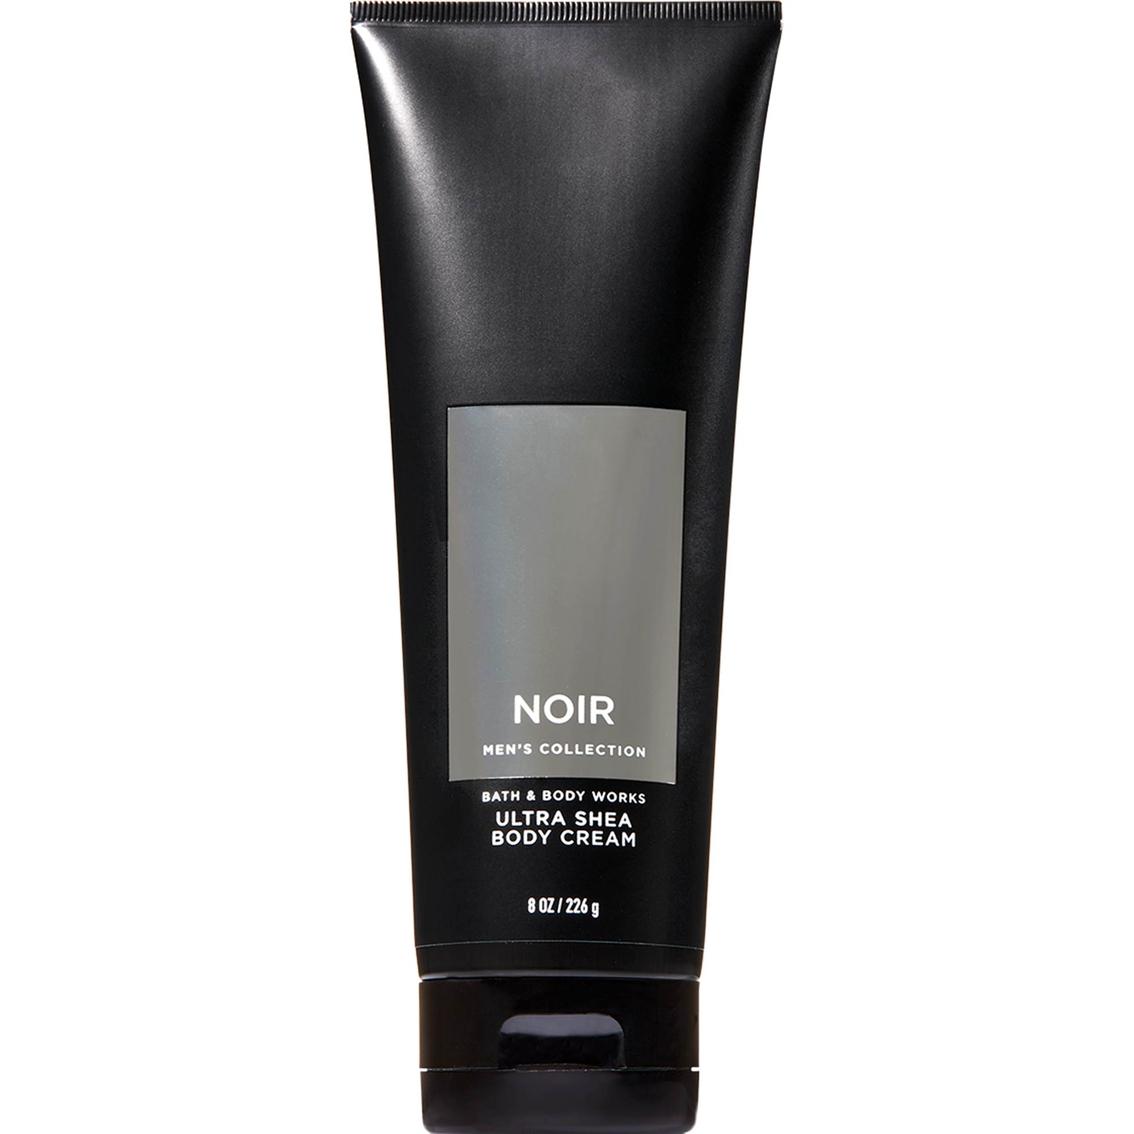 f258687f89 Bath & Body Works Men's Noir Body Cream | Body & Hair Care | Beauty ...